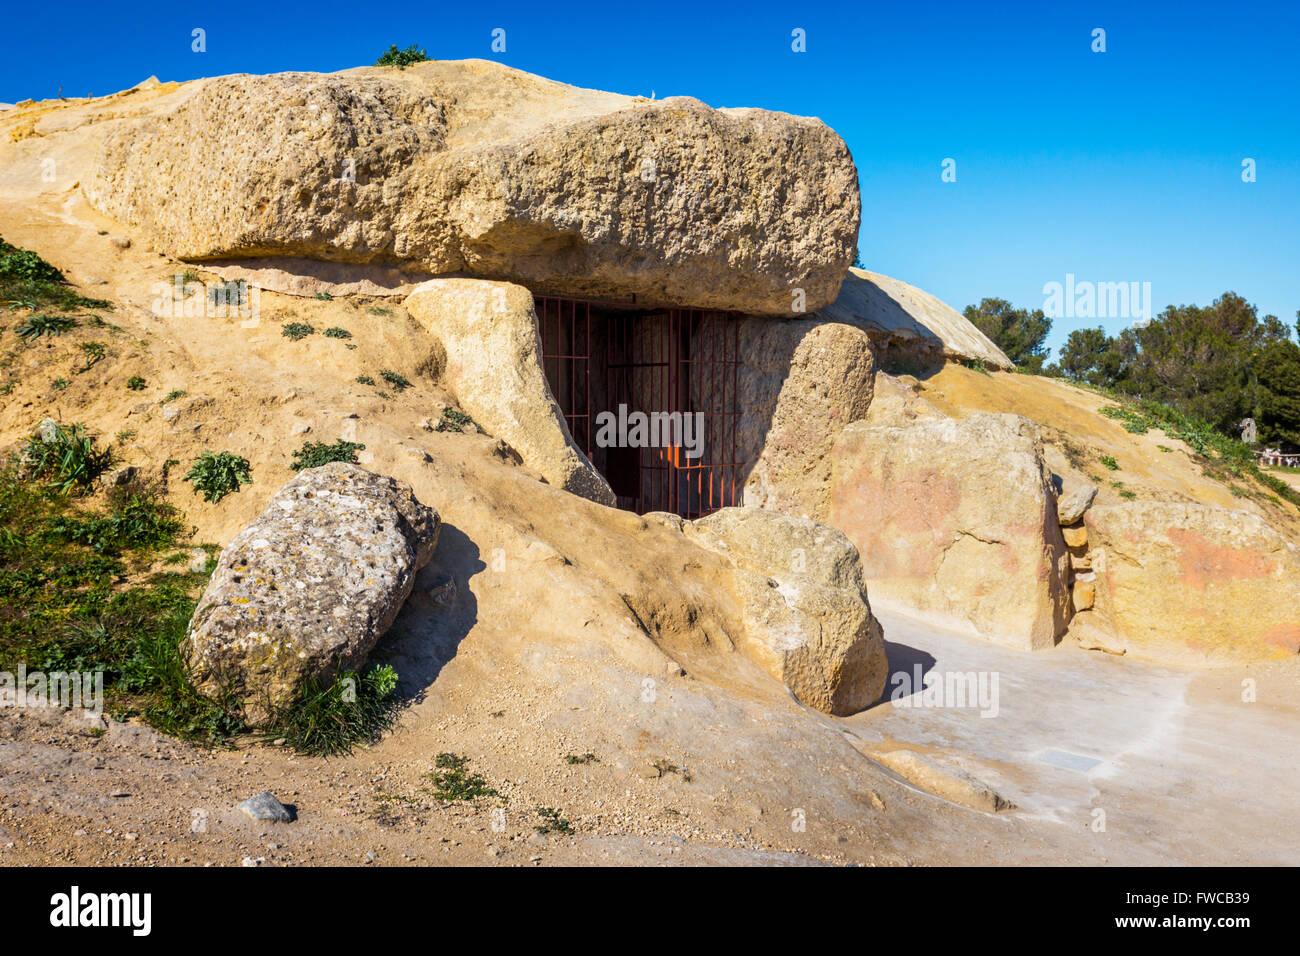 Antequera, Malaga Province, Andalusia, southern Spain.  Entrance to the La Menga Dolmen. - Stock Image